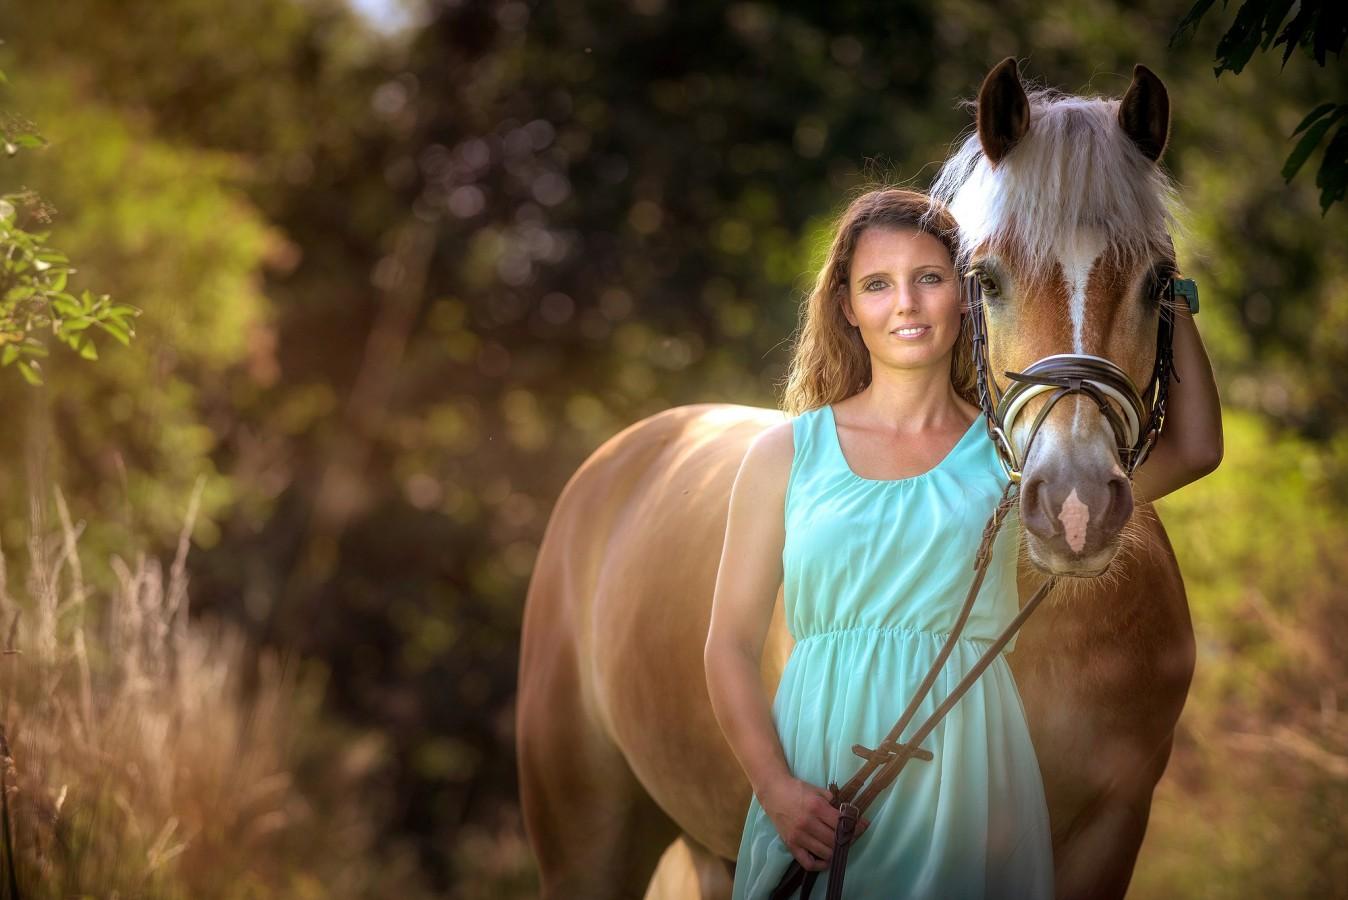 EQUIVA Siegen Gewinnspiel Pferdeshooting Miriam Gerhard mit Reitbeteiligung